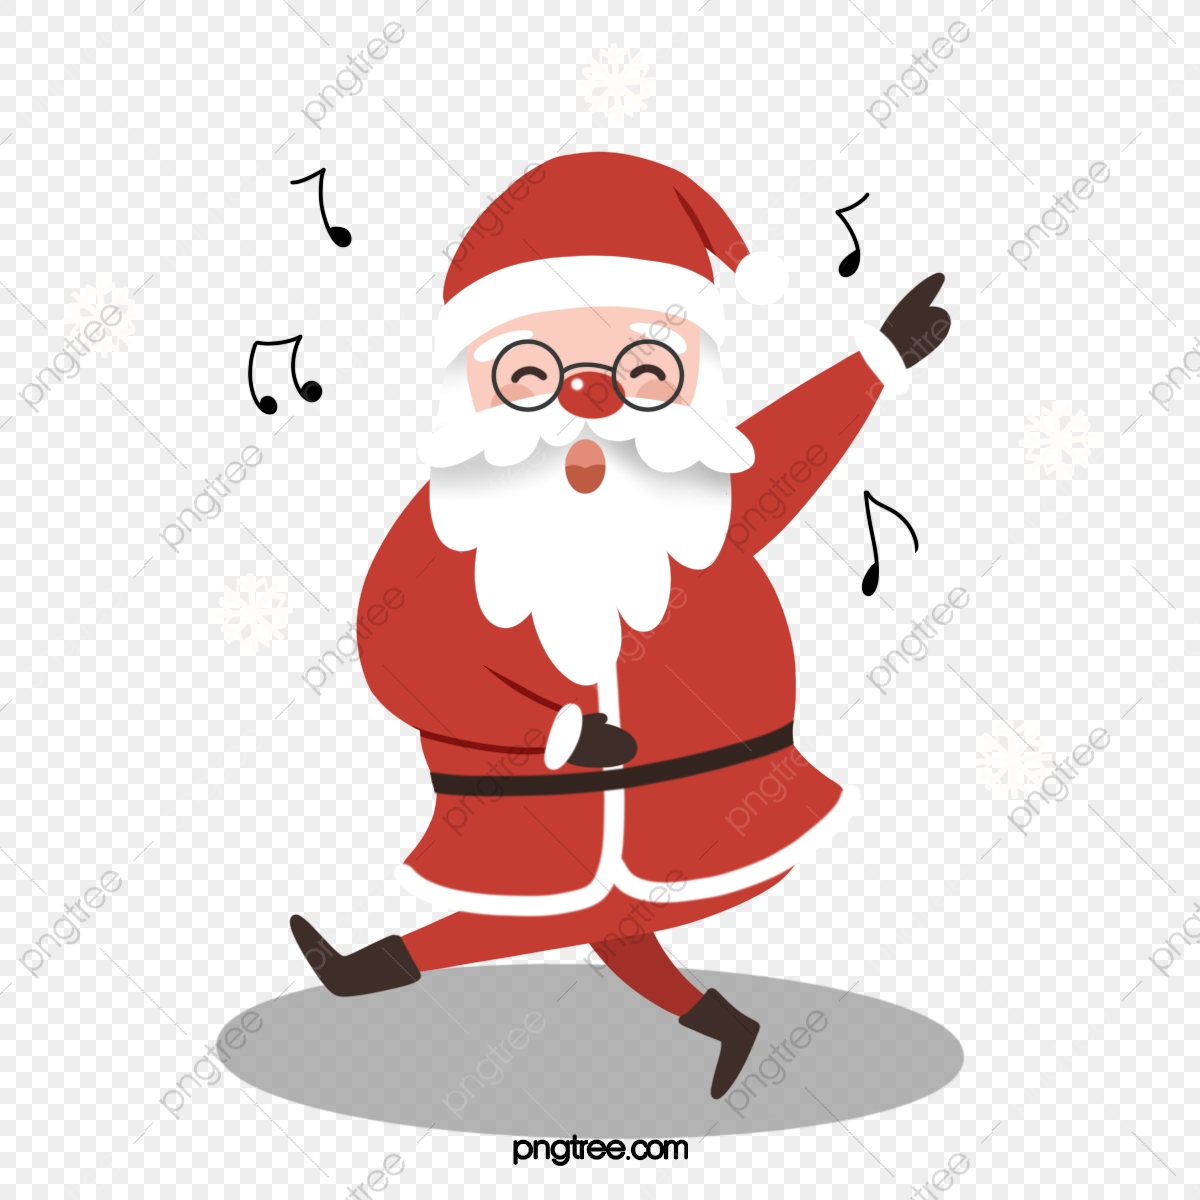 Cute Dancing Santa Santa Claus Christmas Dance Png Transparent Clipart Image And Psd File For Free Download